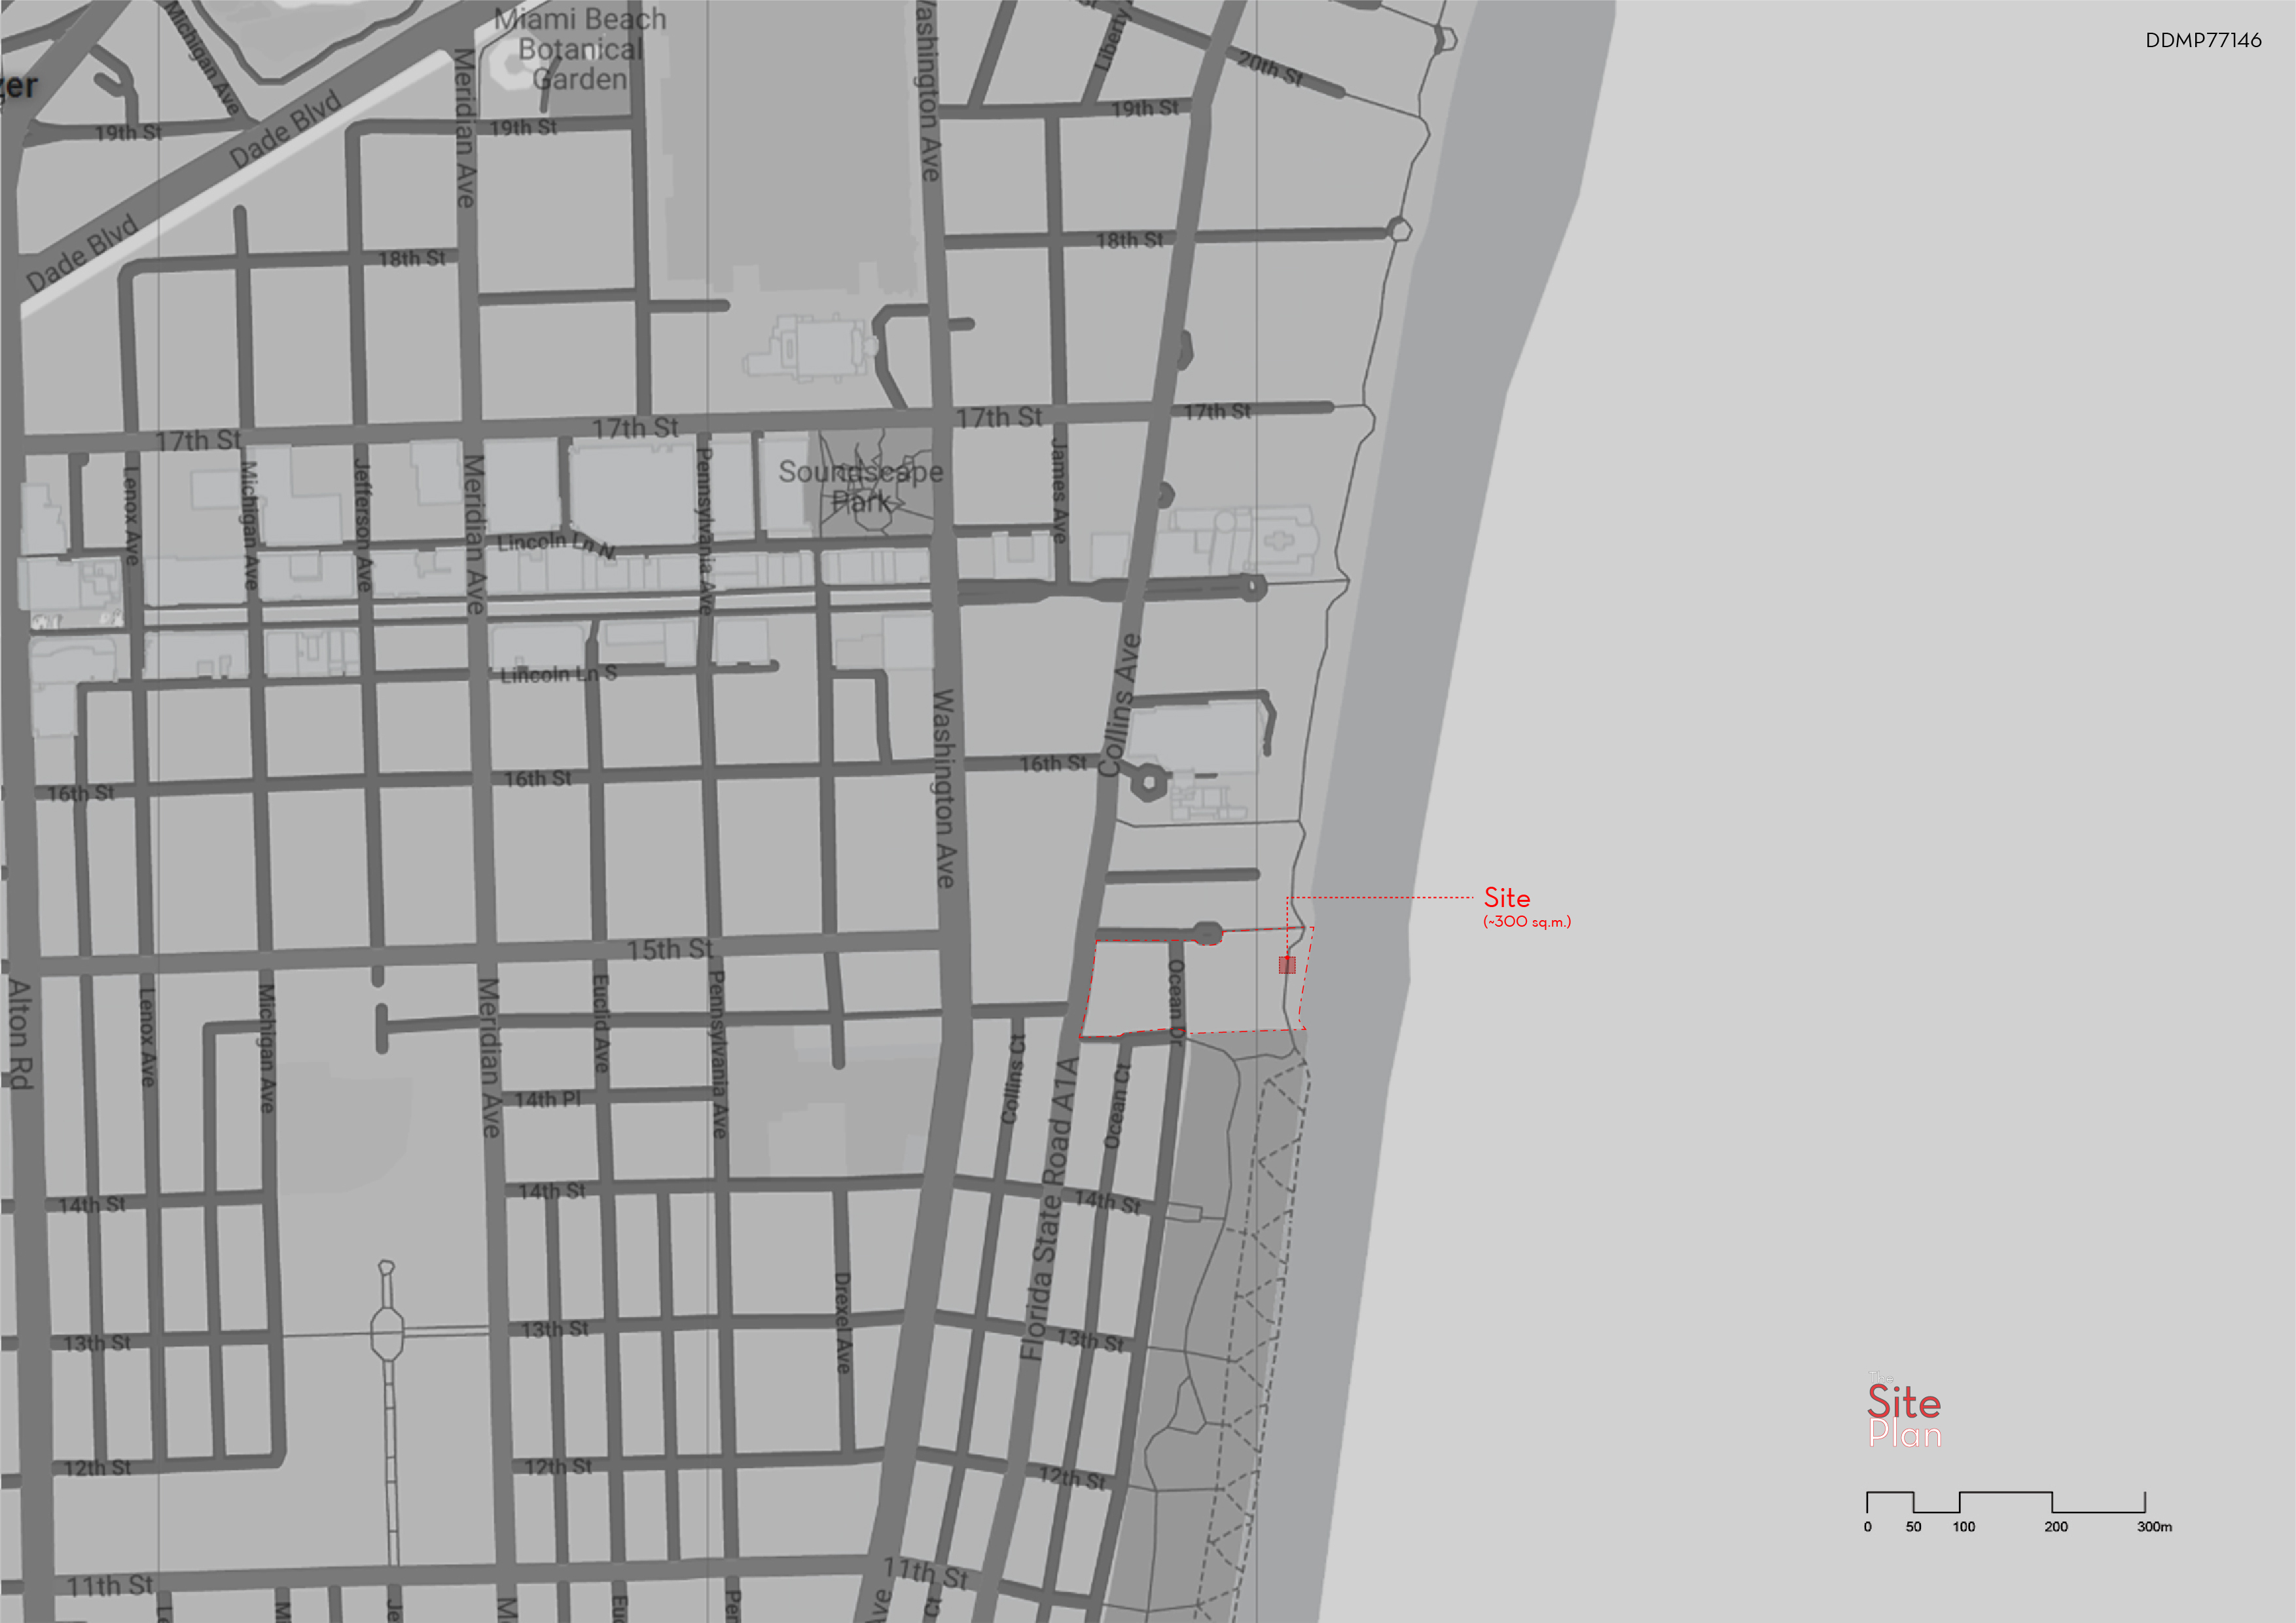 (DDMP77146) 01 Site Plan-01